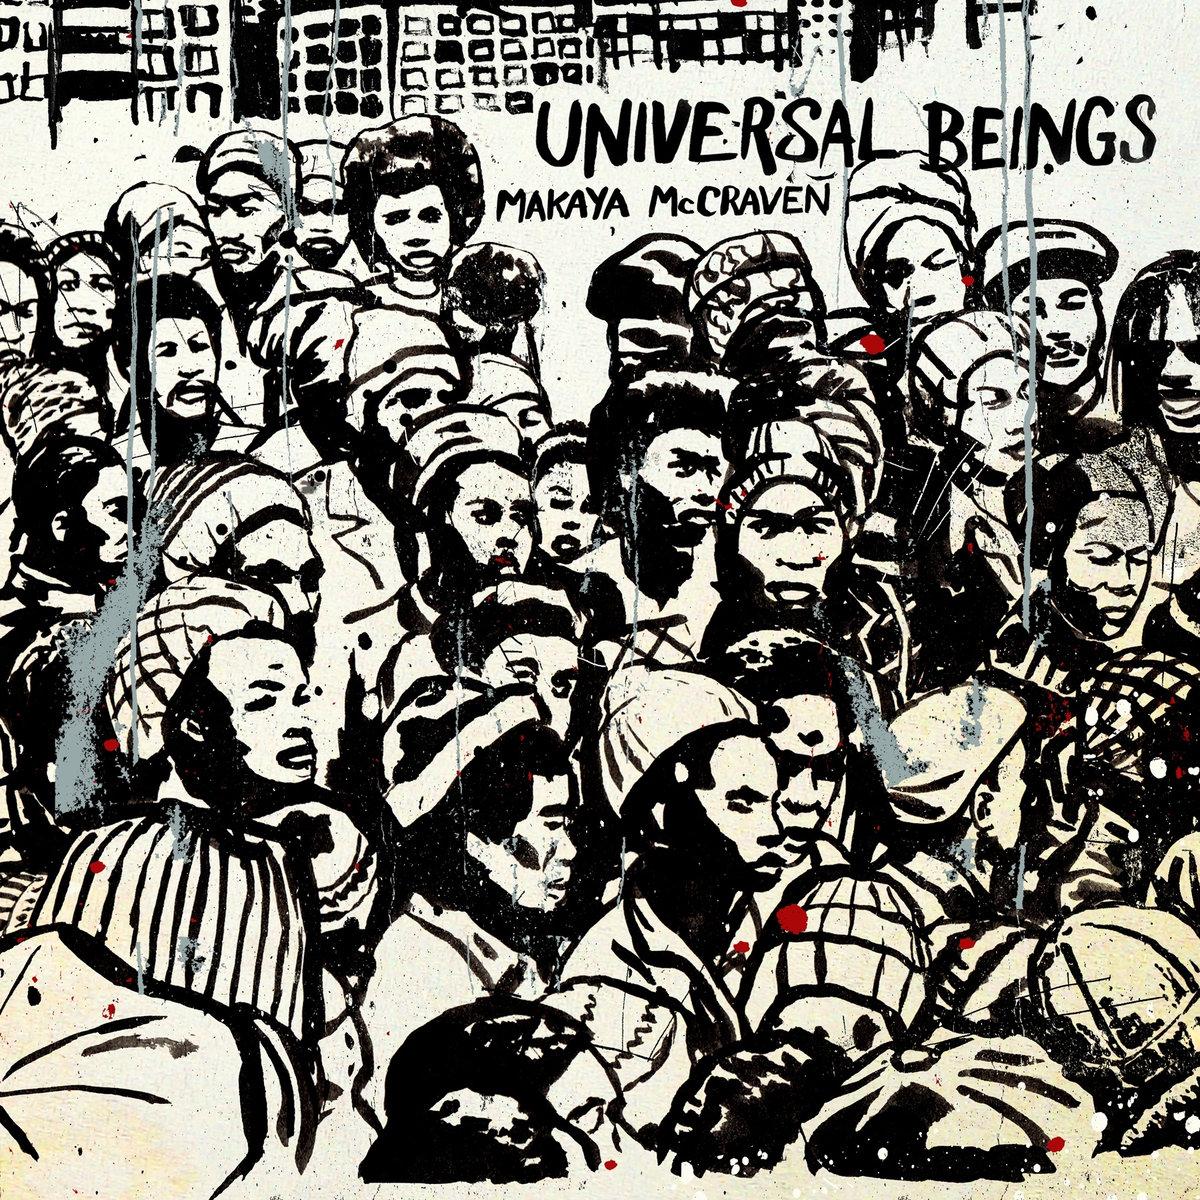 Album des Tages: Makaya McCraven - Universal Beings